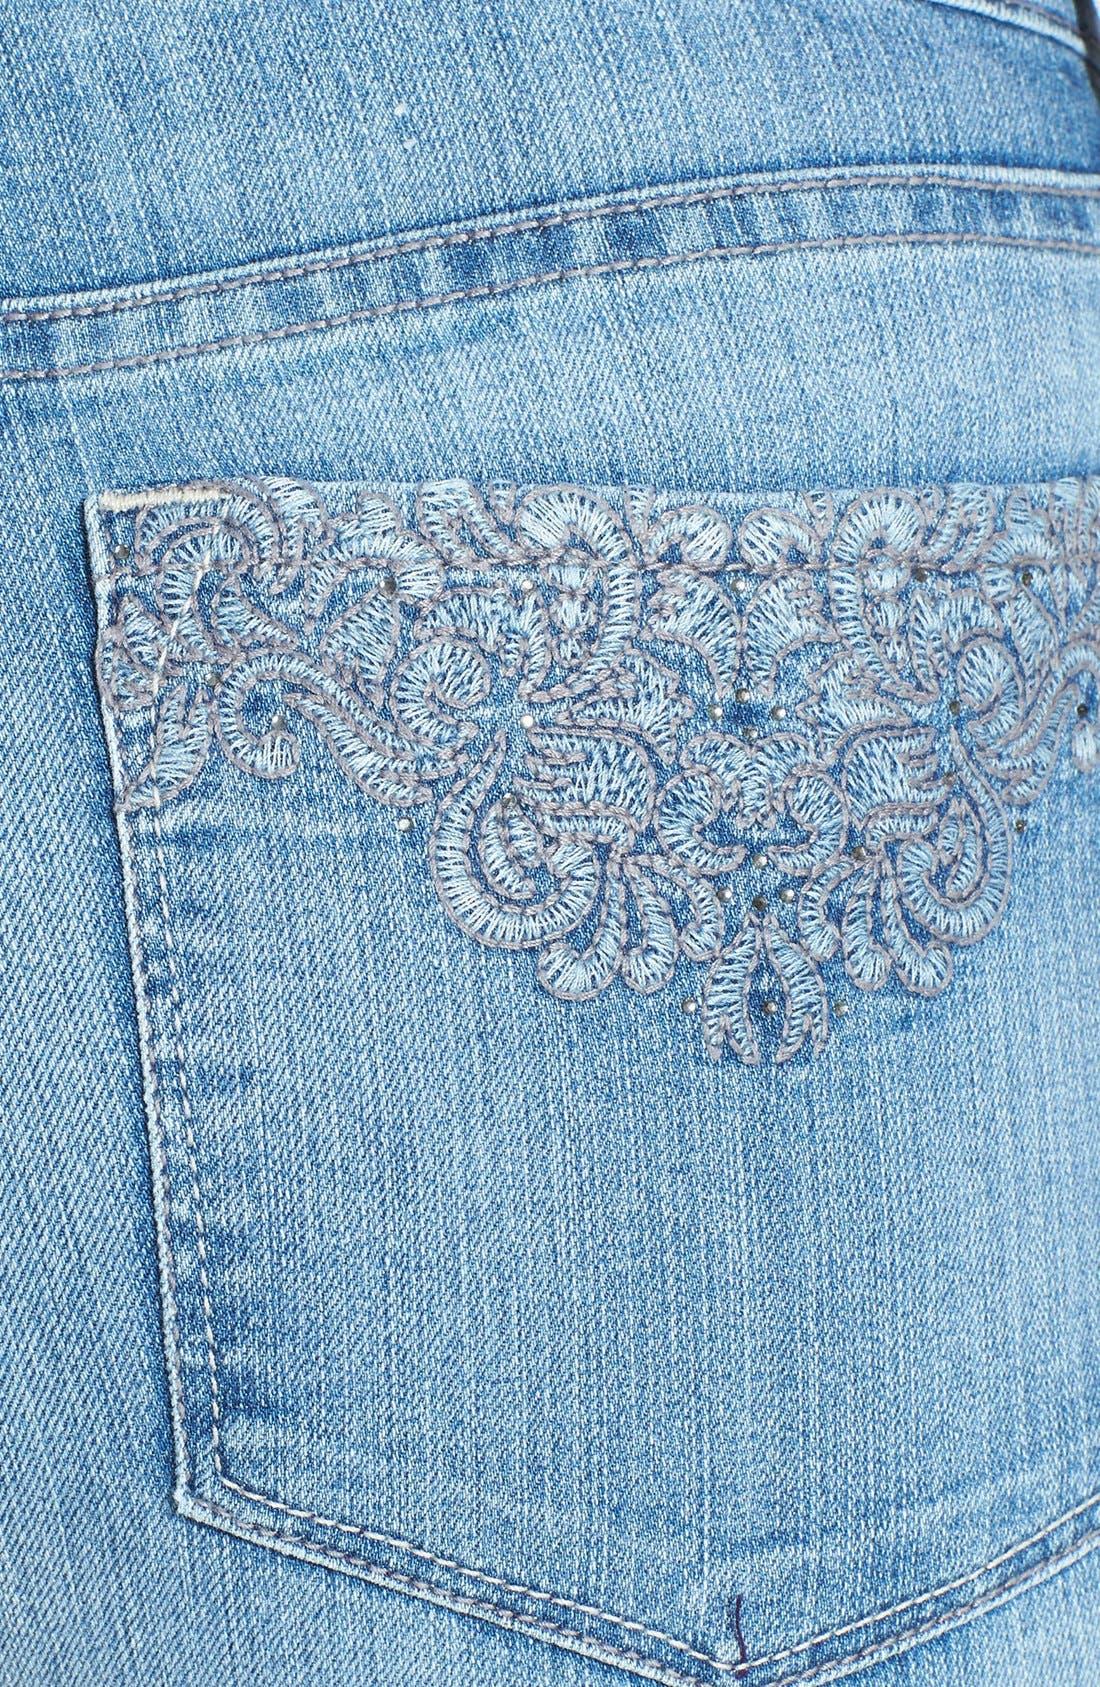 Alternate Image 3  - NYDJ 'Sheri' Stretch Skinny Jeans (Palos Verdes) (Regular & Petite)